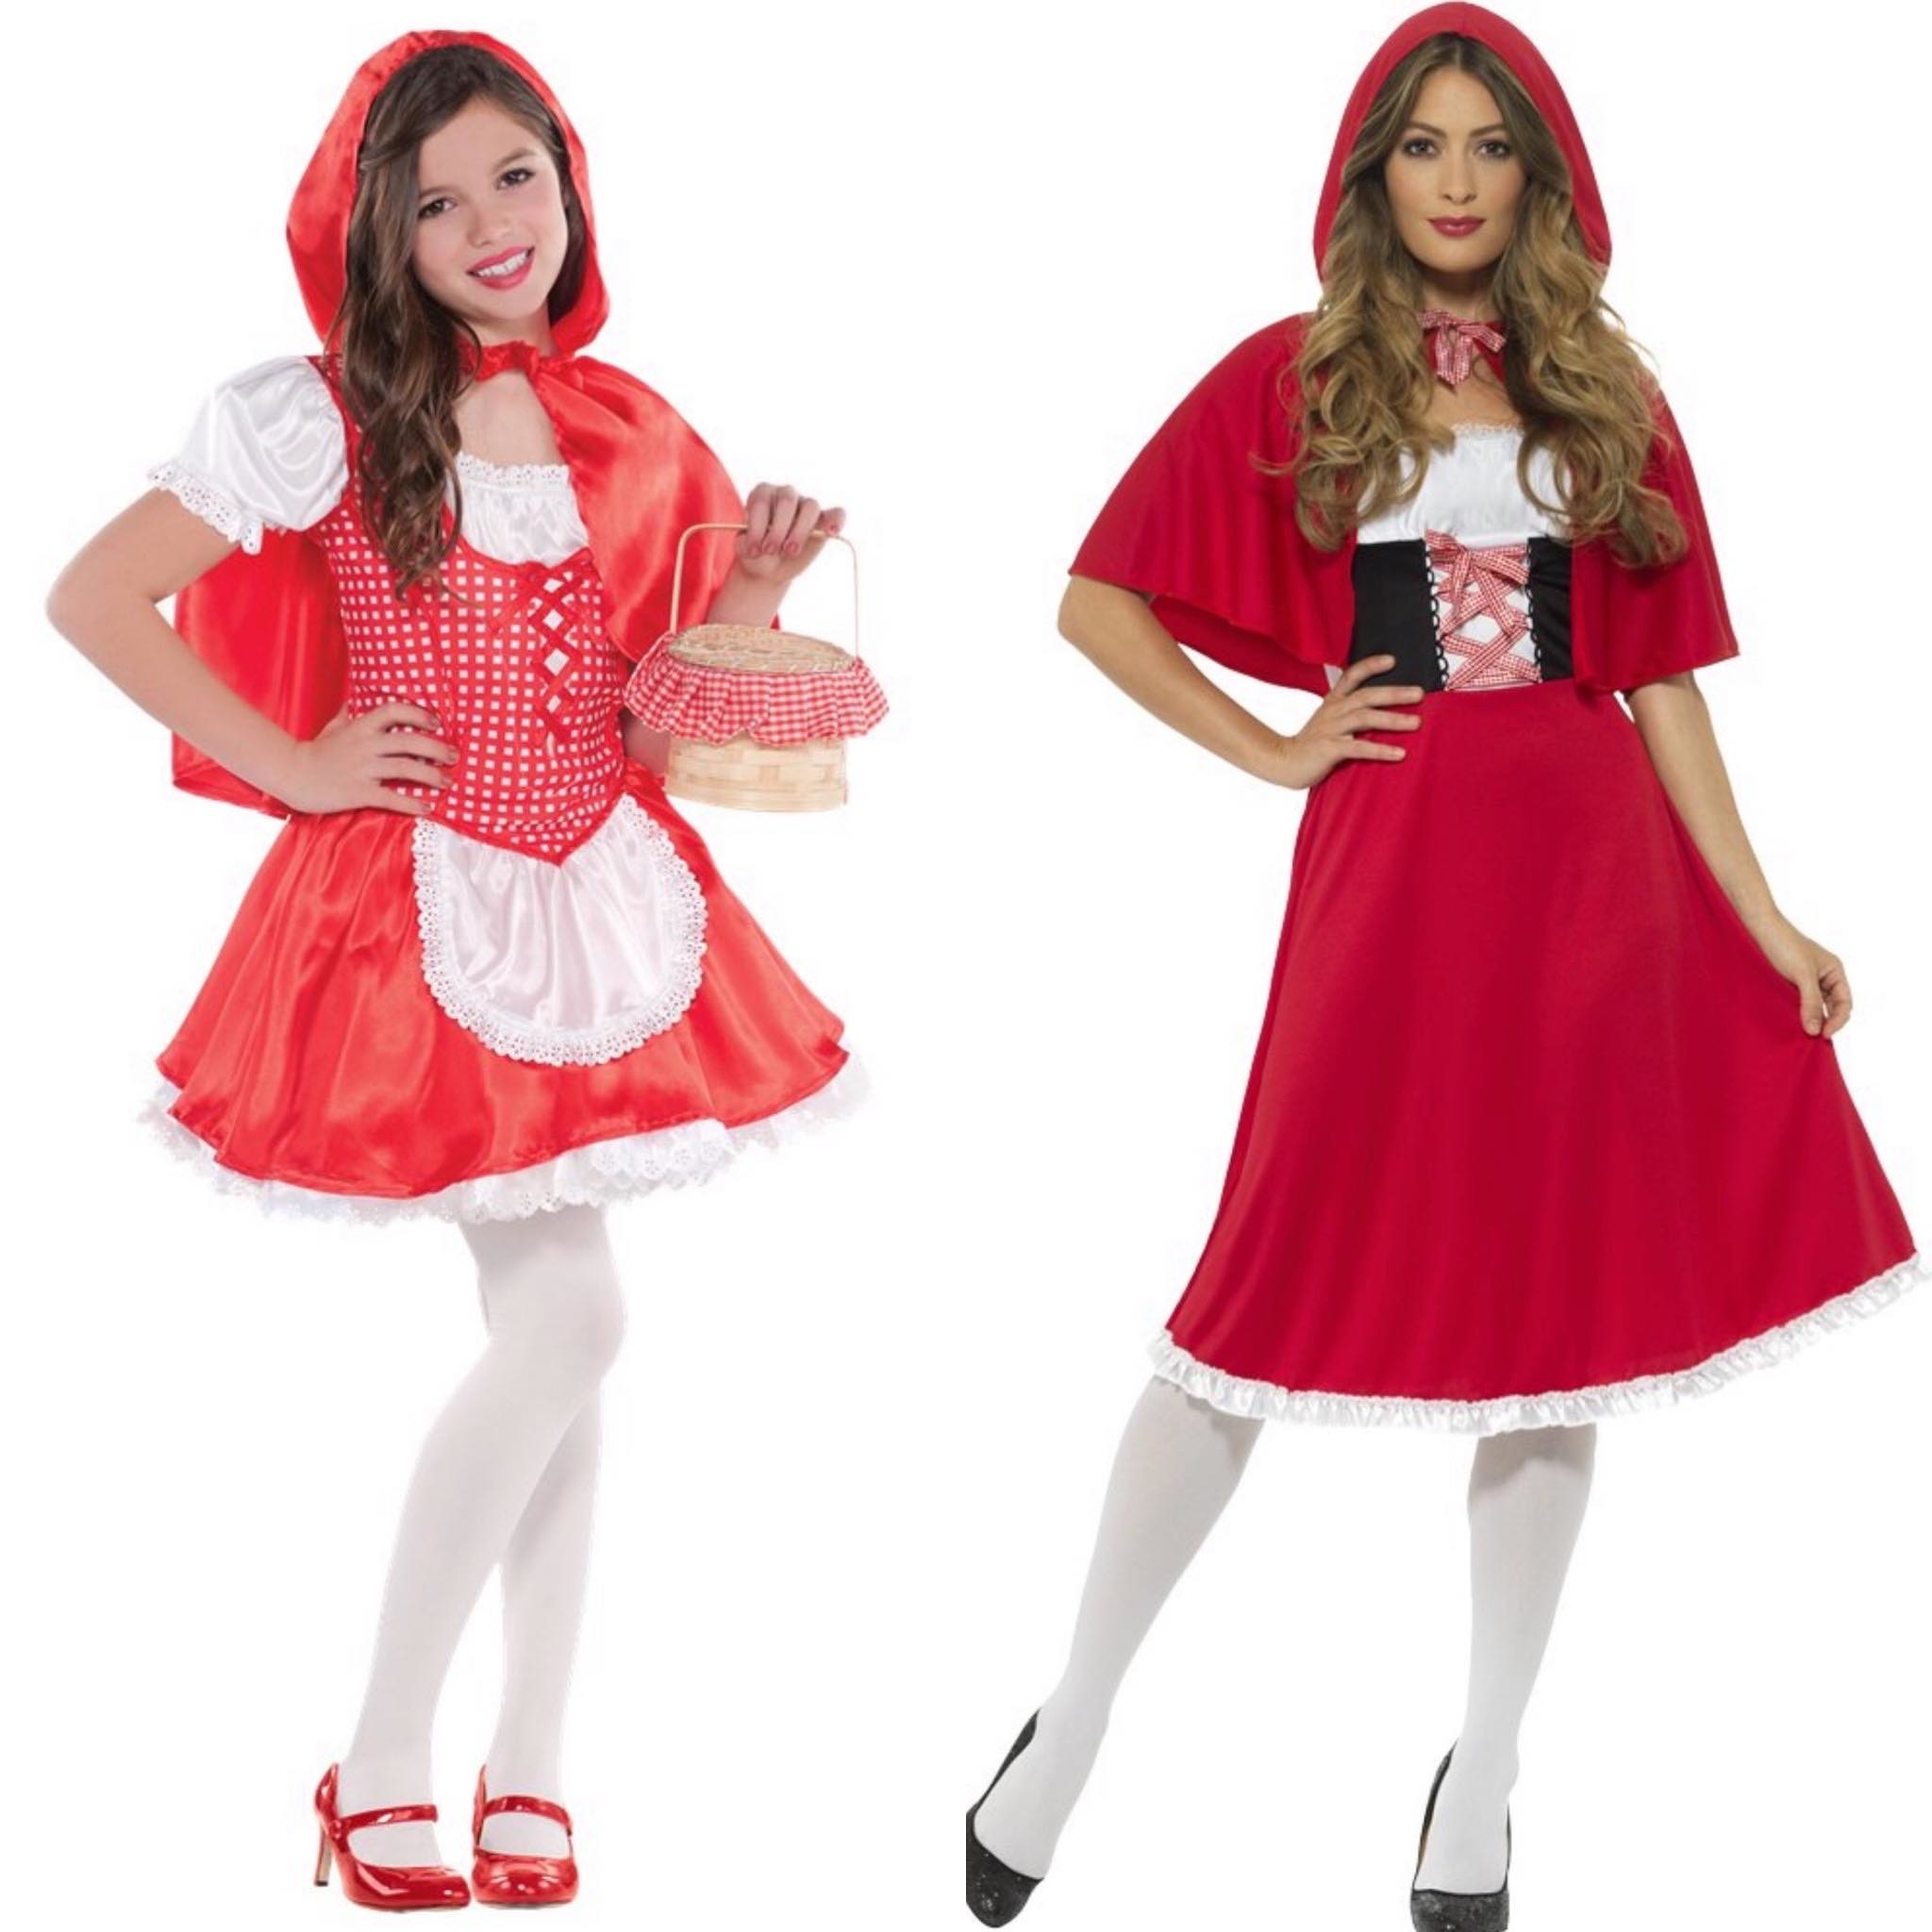 Roodkapje moeder en dochter kostuum